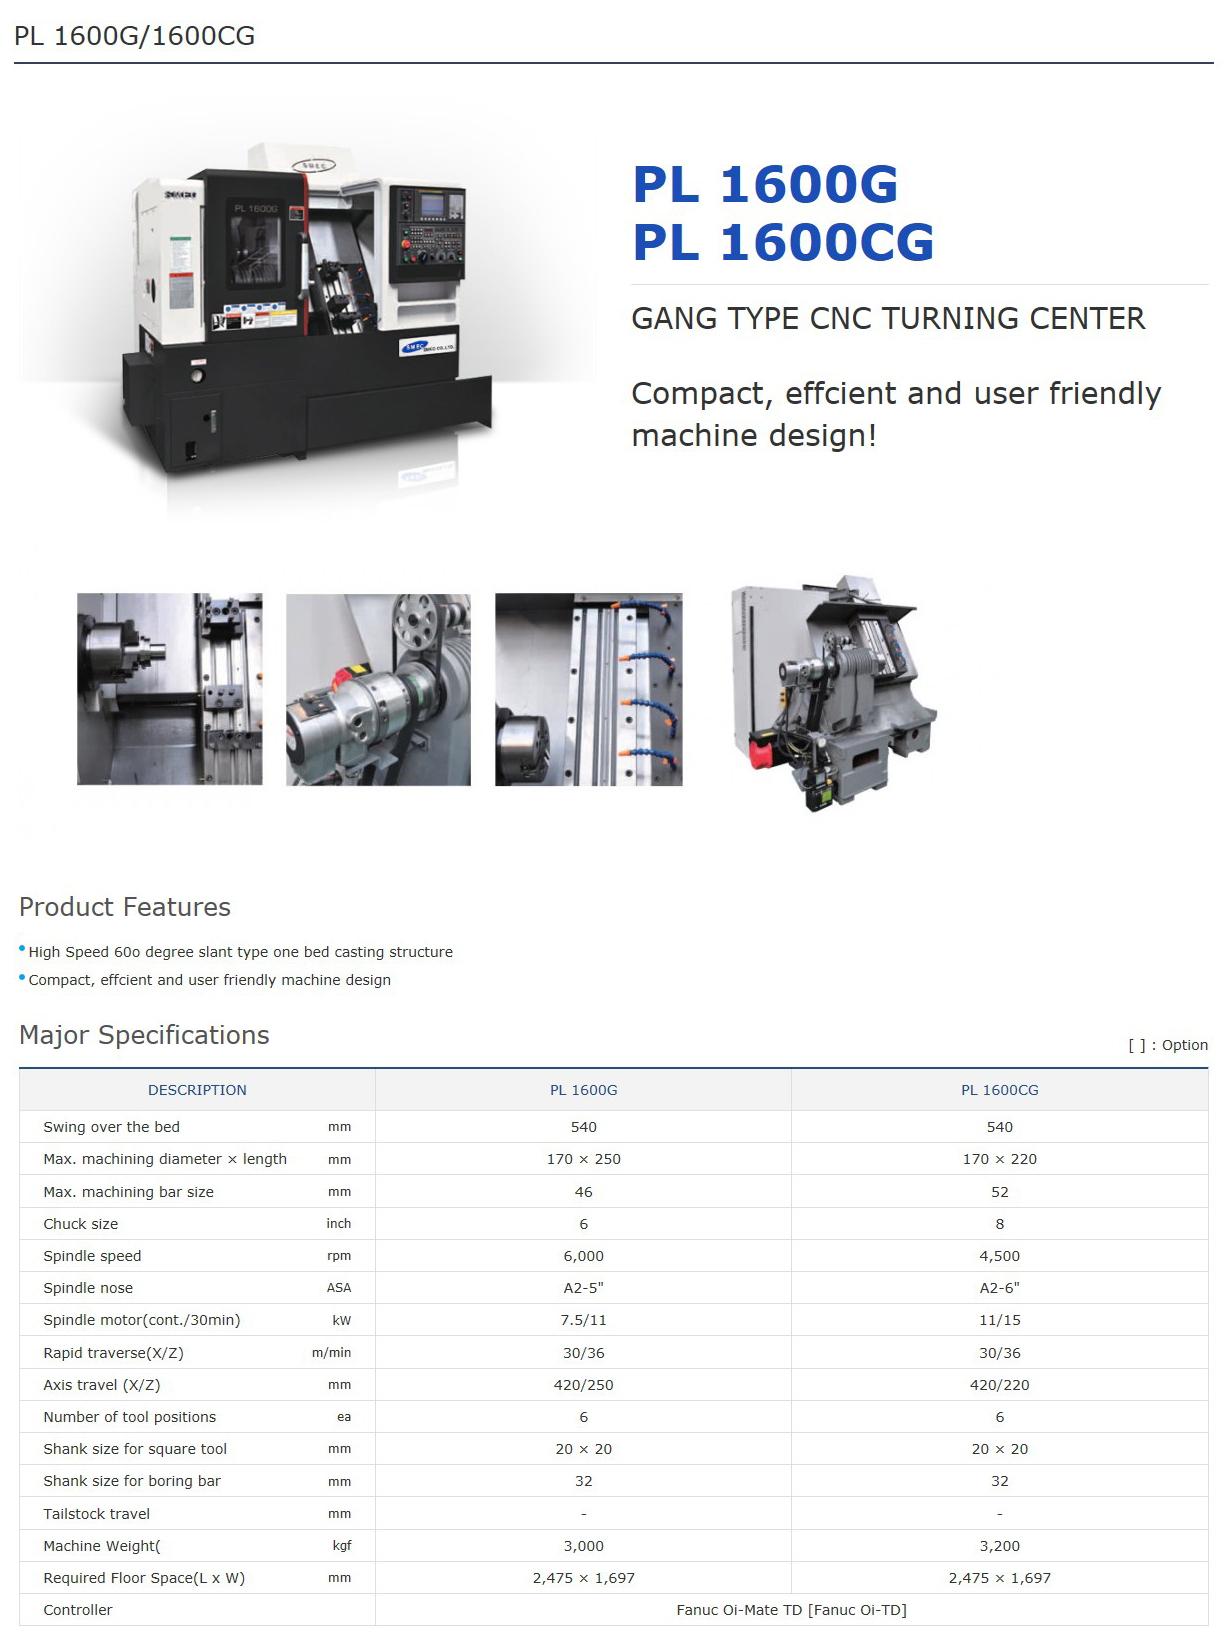 SMEC Gang Type CNC Turning Center PL 1600G, PL 1600CG